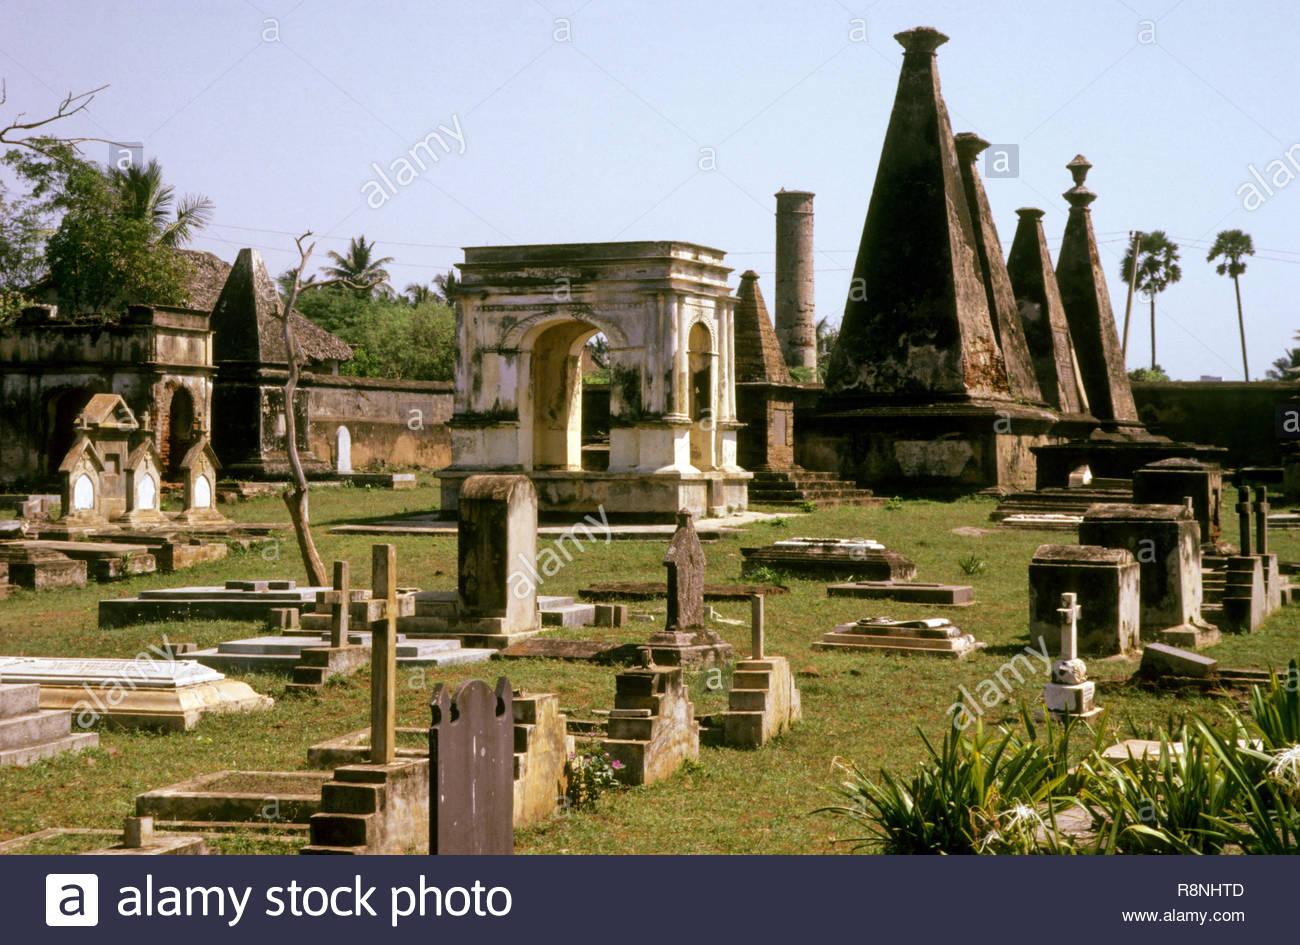 Xvii annuncio cimitero olandese, Andhra Pradesh, India Immagini Stock